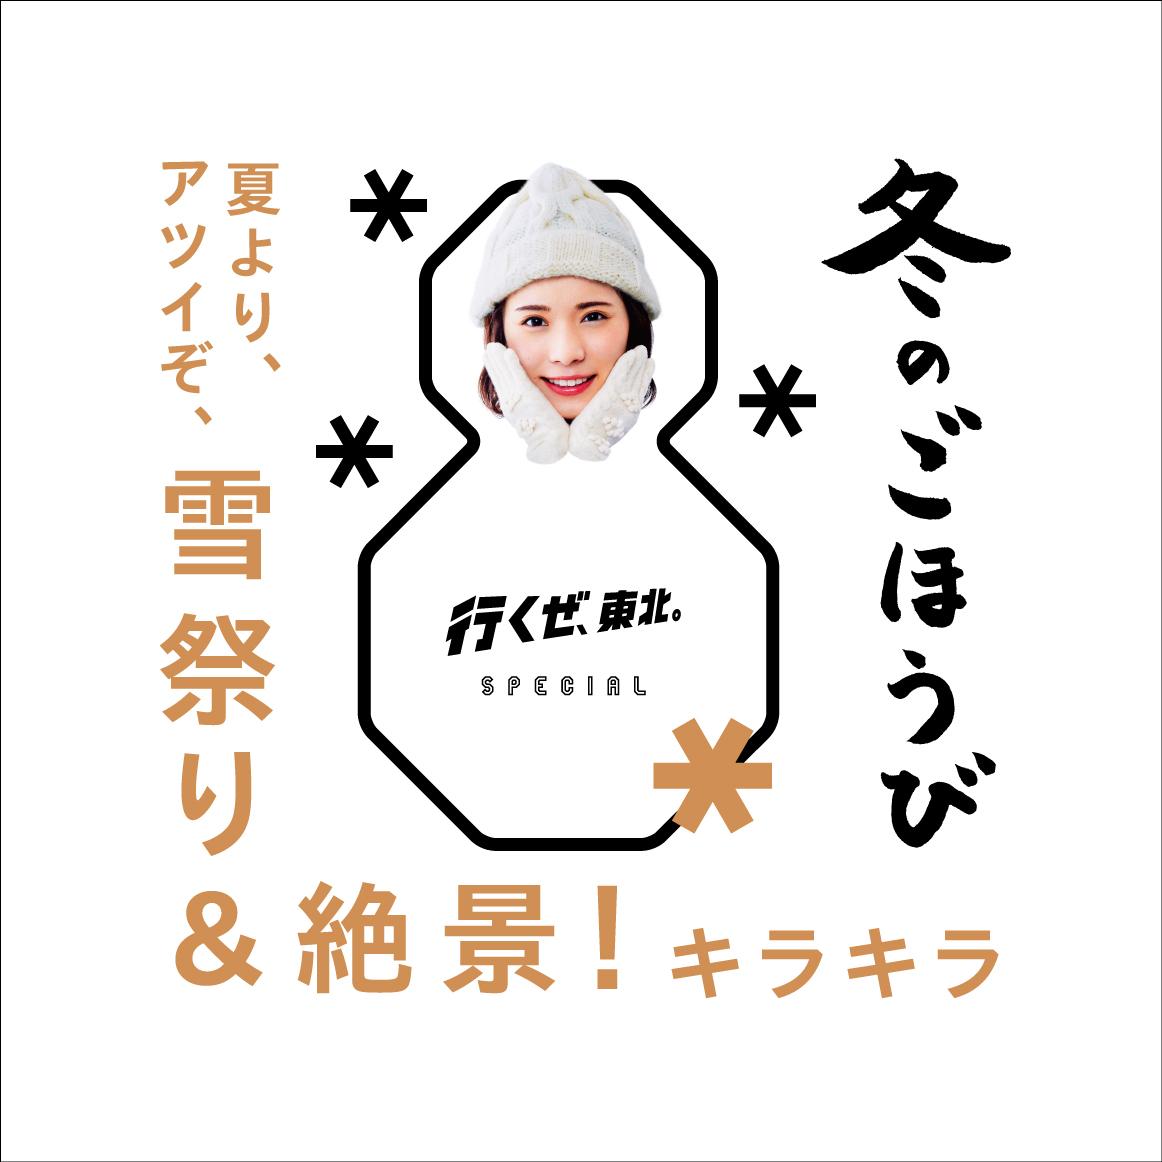 JR_ikuze_2016_fuyu_no_gohobi_guidbook_nakatobira_yuki